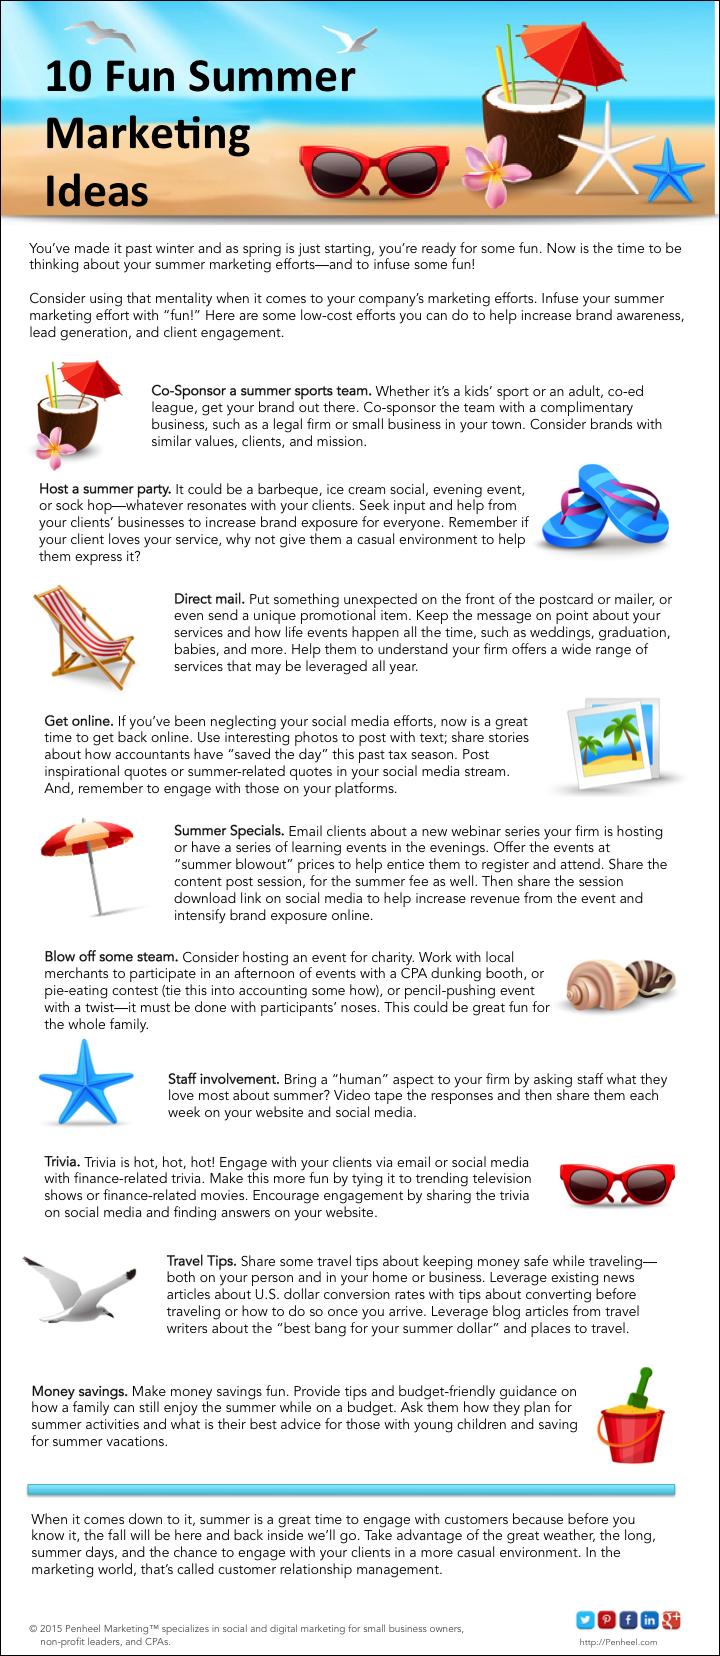 10 Fun Summer Marketing Tips